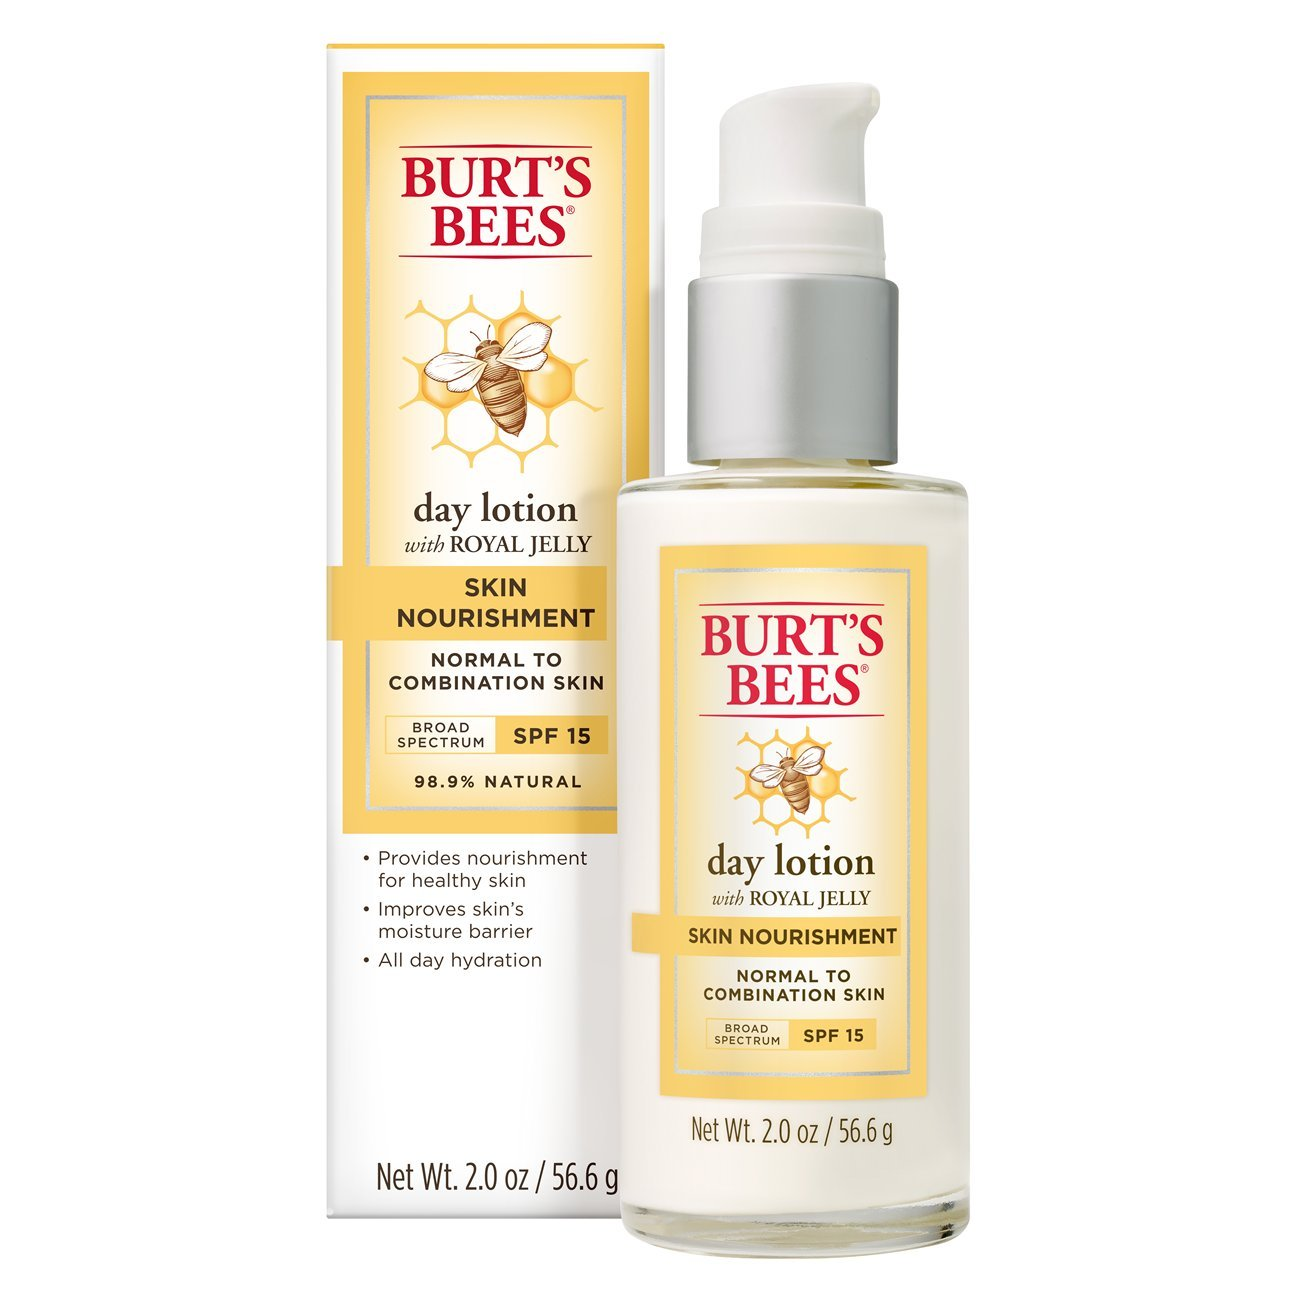 Burt's Bees Skin Nourishment Day Lotion with SPF 15, 2 Ounces Burt' s Bees Inc. 792850894952